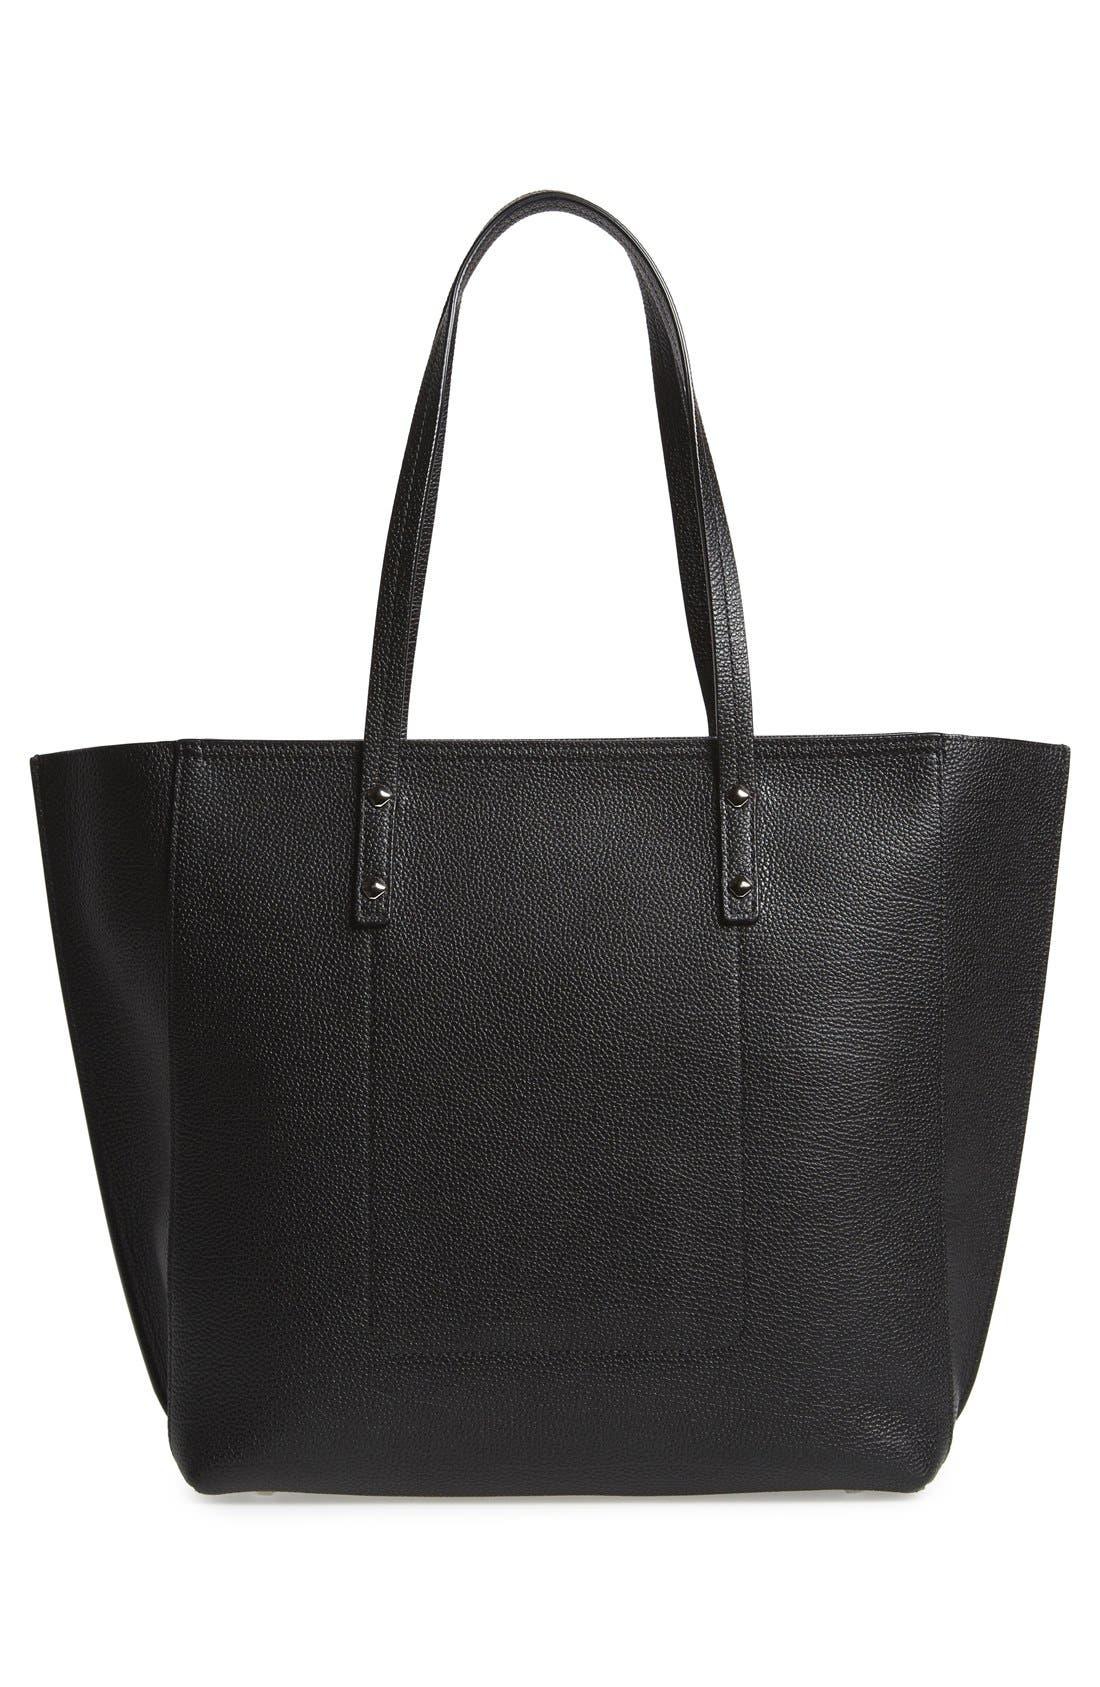 'Medium Sophie' Leather Shopper,                             Alternate thumbnail 4, color,                             001